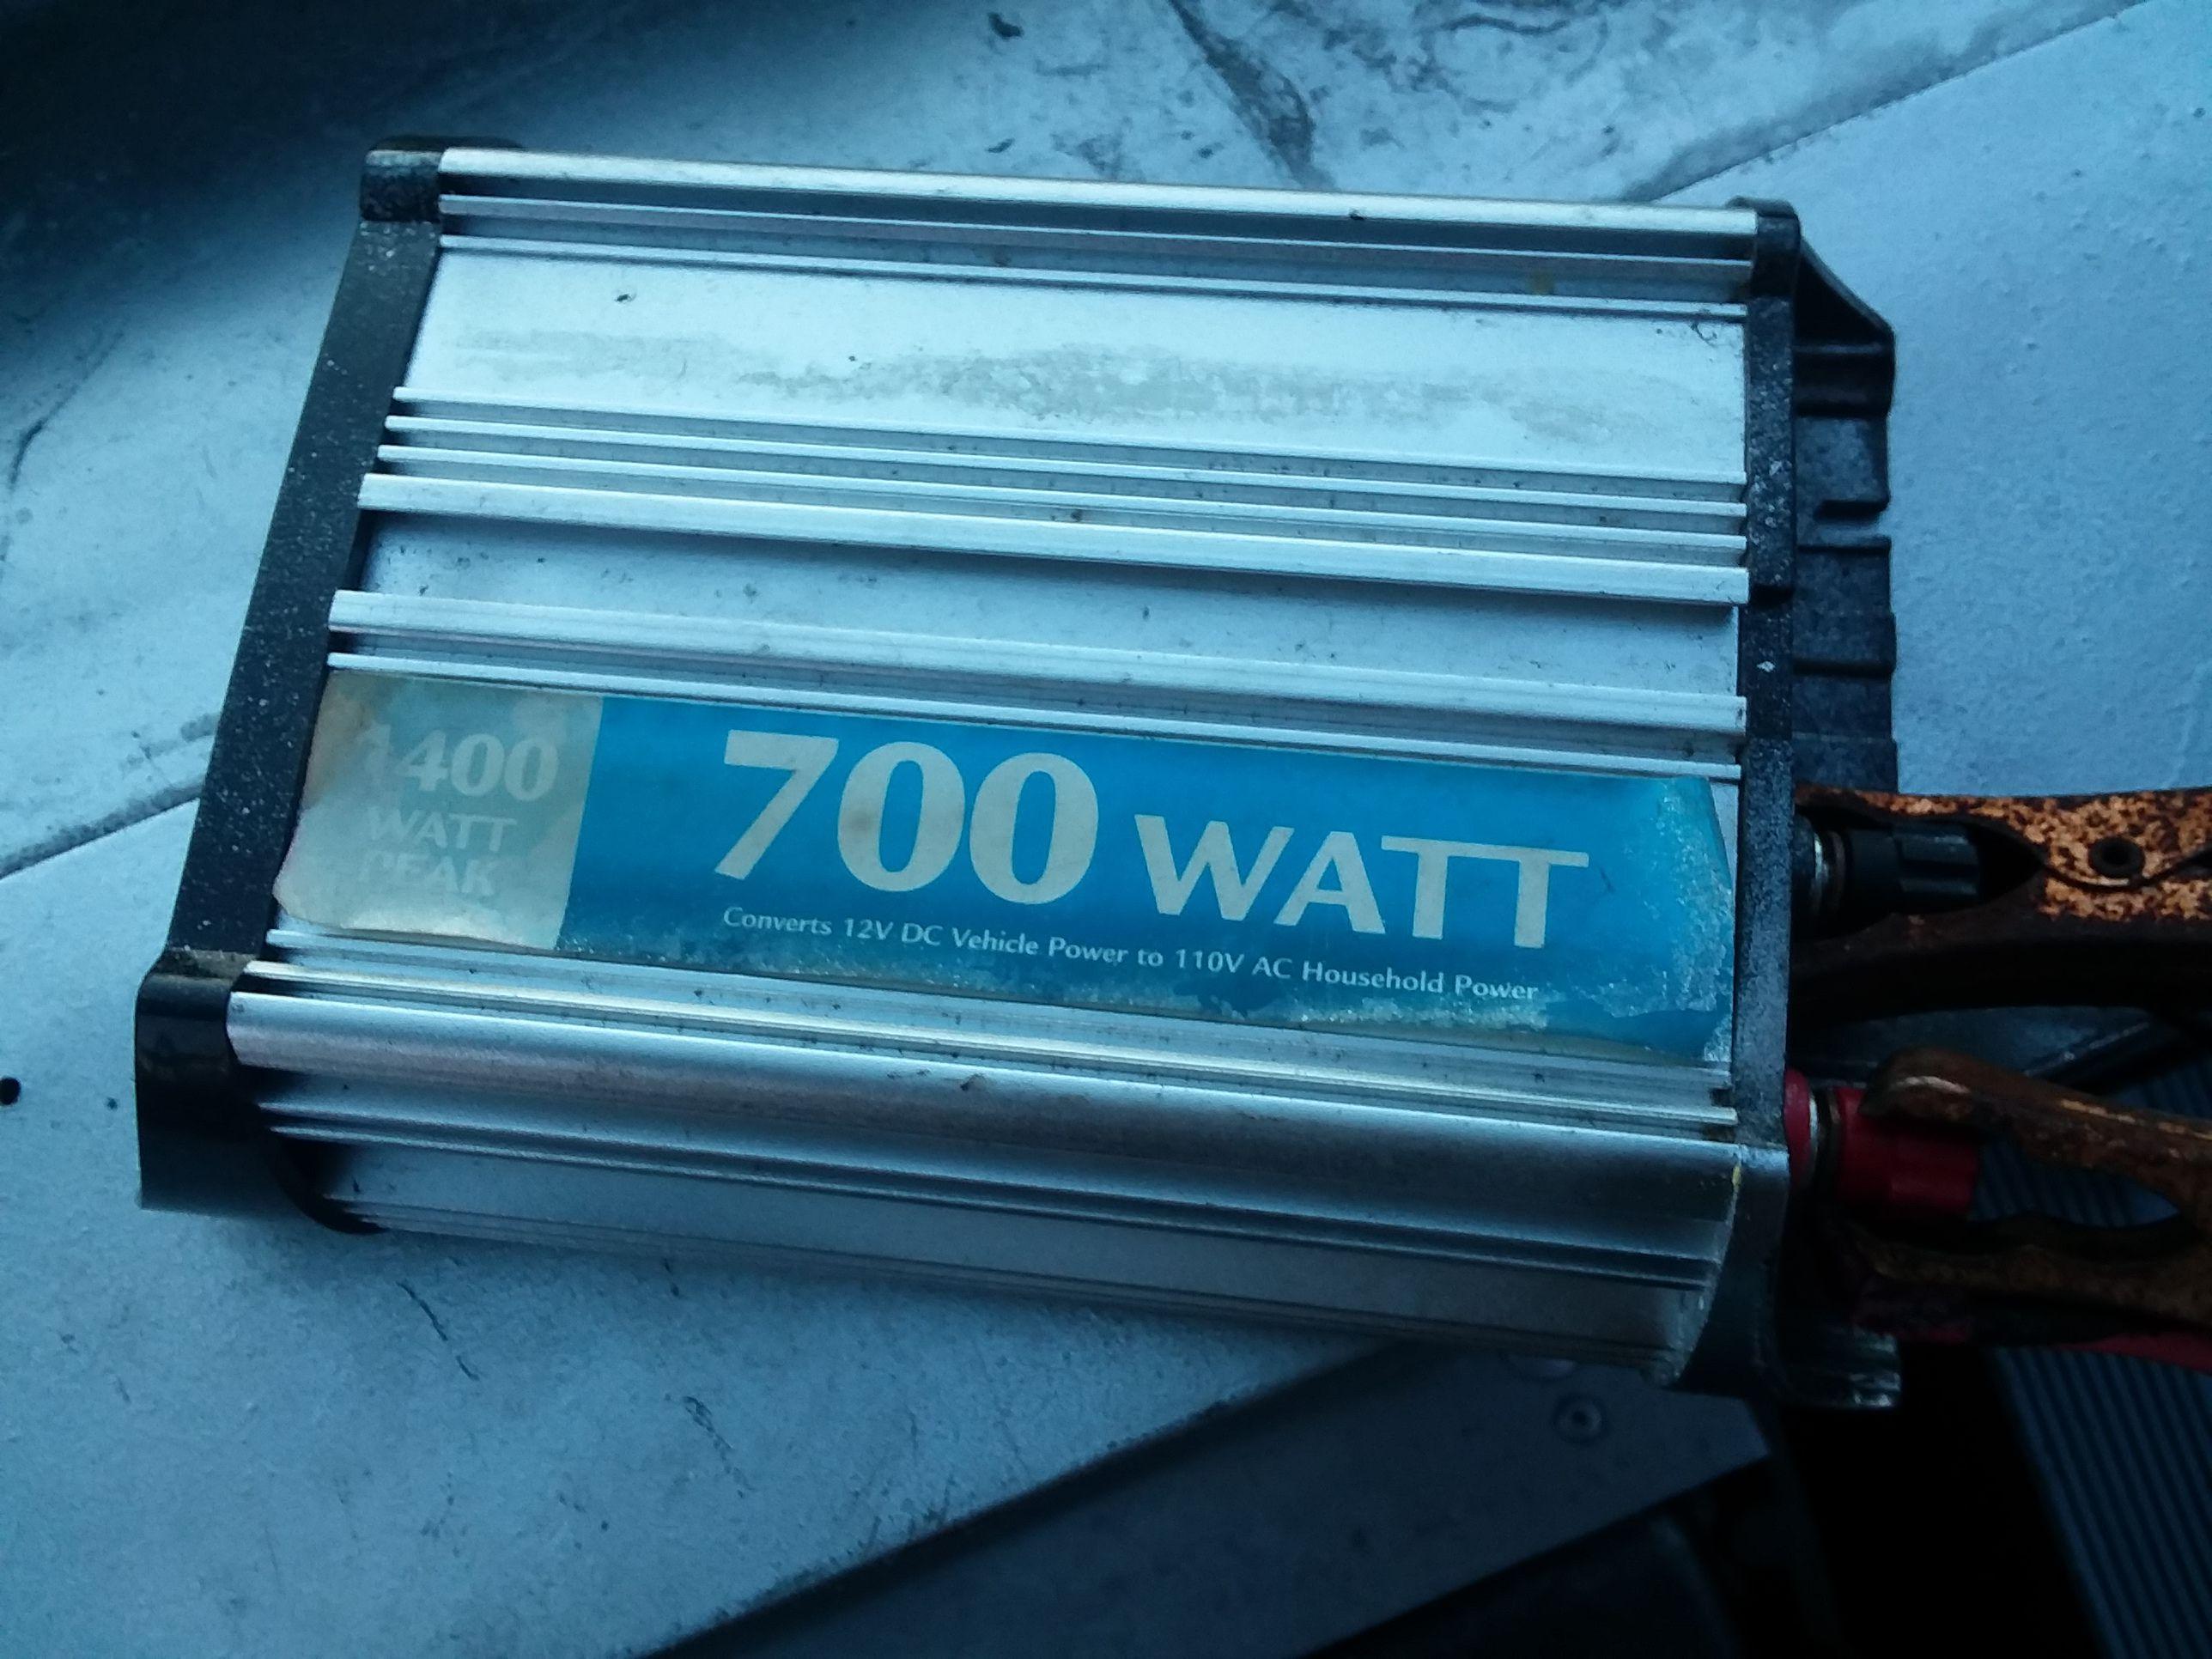 Invertedor battery